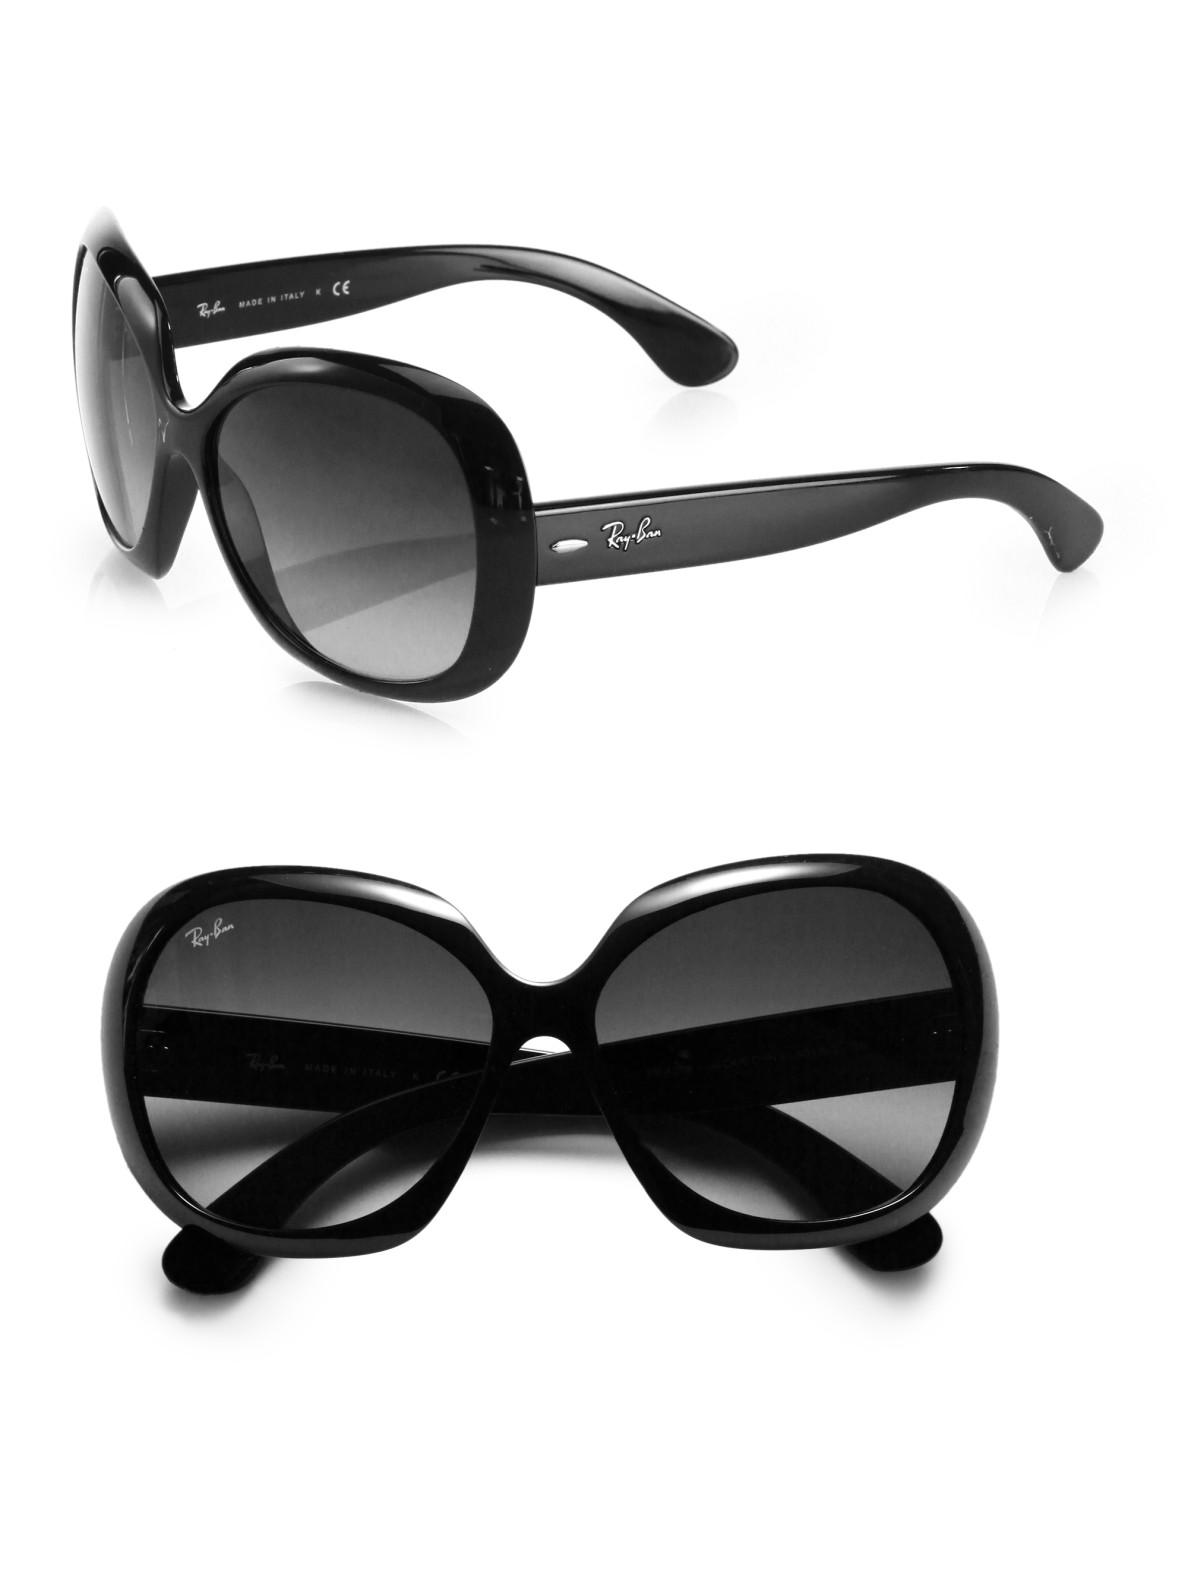 512556c5865e0 Ray-Ban Women s Vintage Oversized Round Jackie Ohh Sunglasses ...